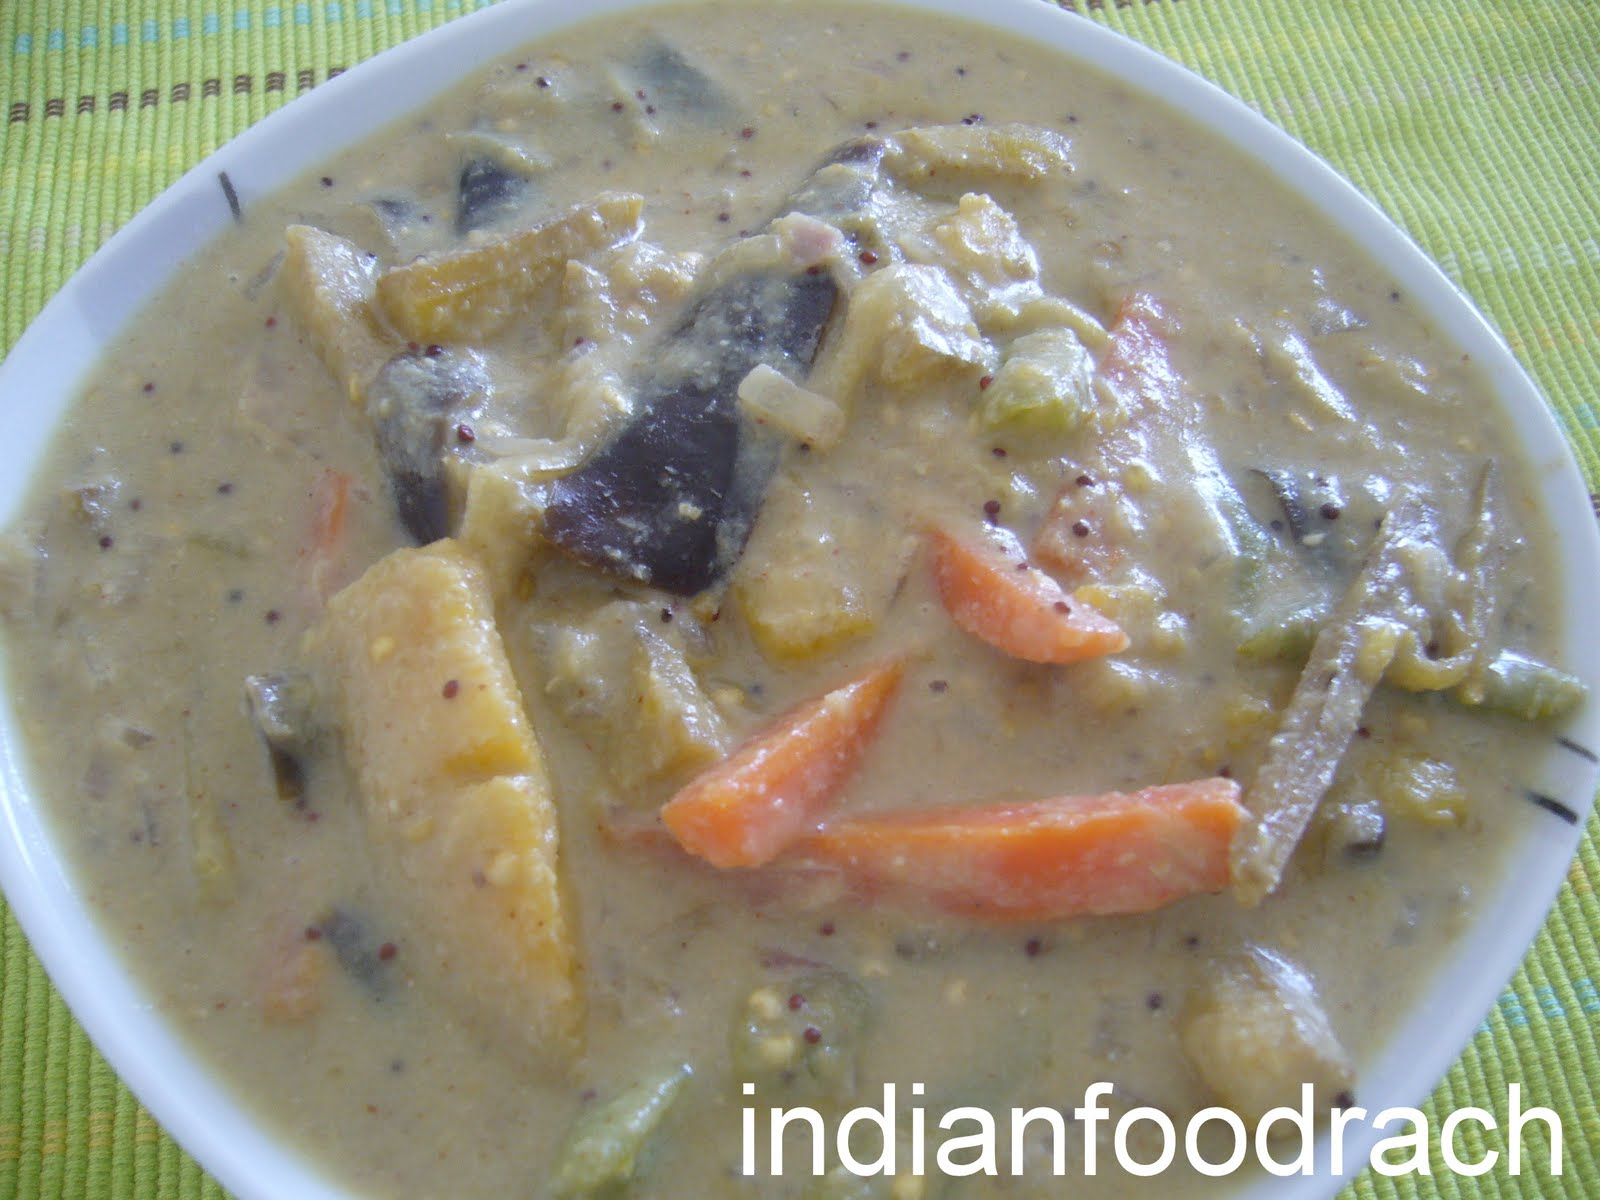 Indian food aviyal avial for Avial indian cuisine